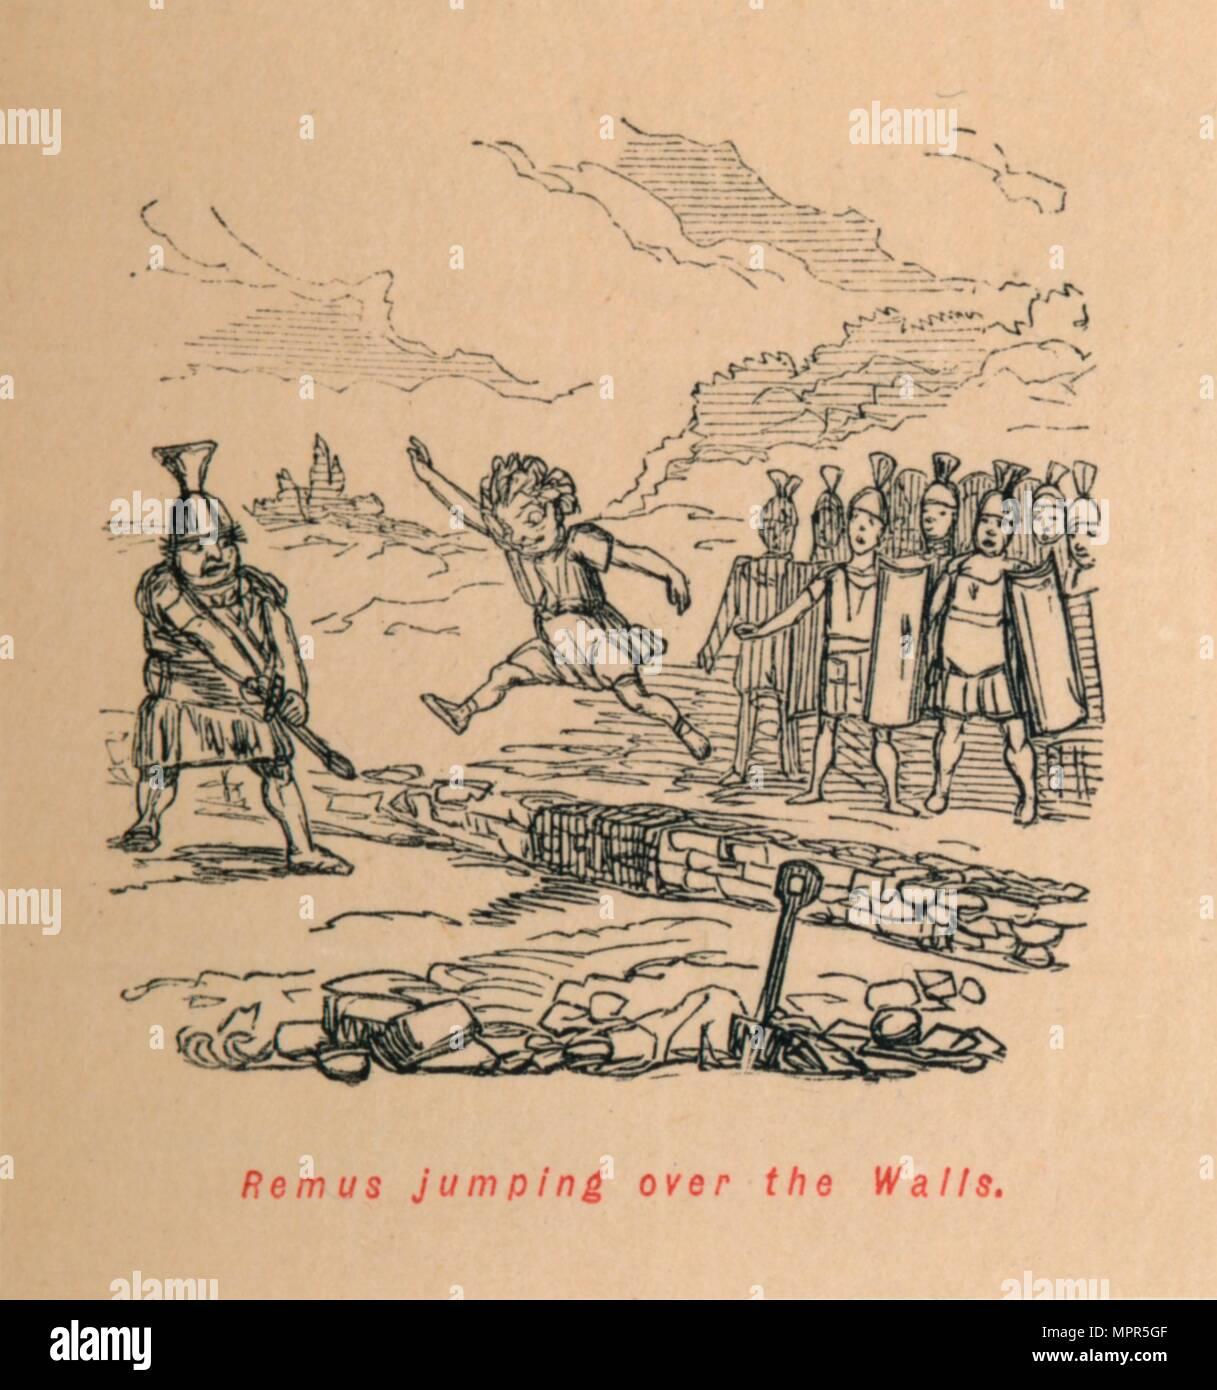 'Remus jumping over the Walls', 1852. Artist: John Leech. - Stock Image